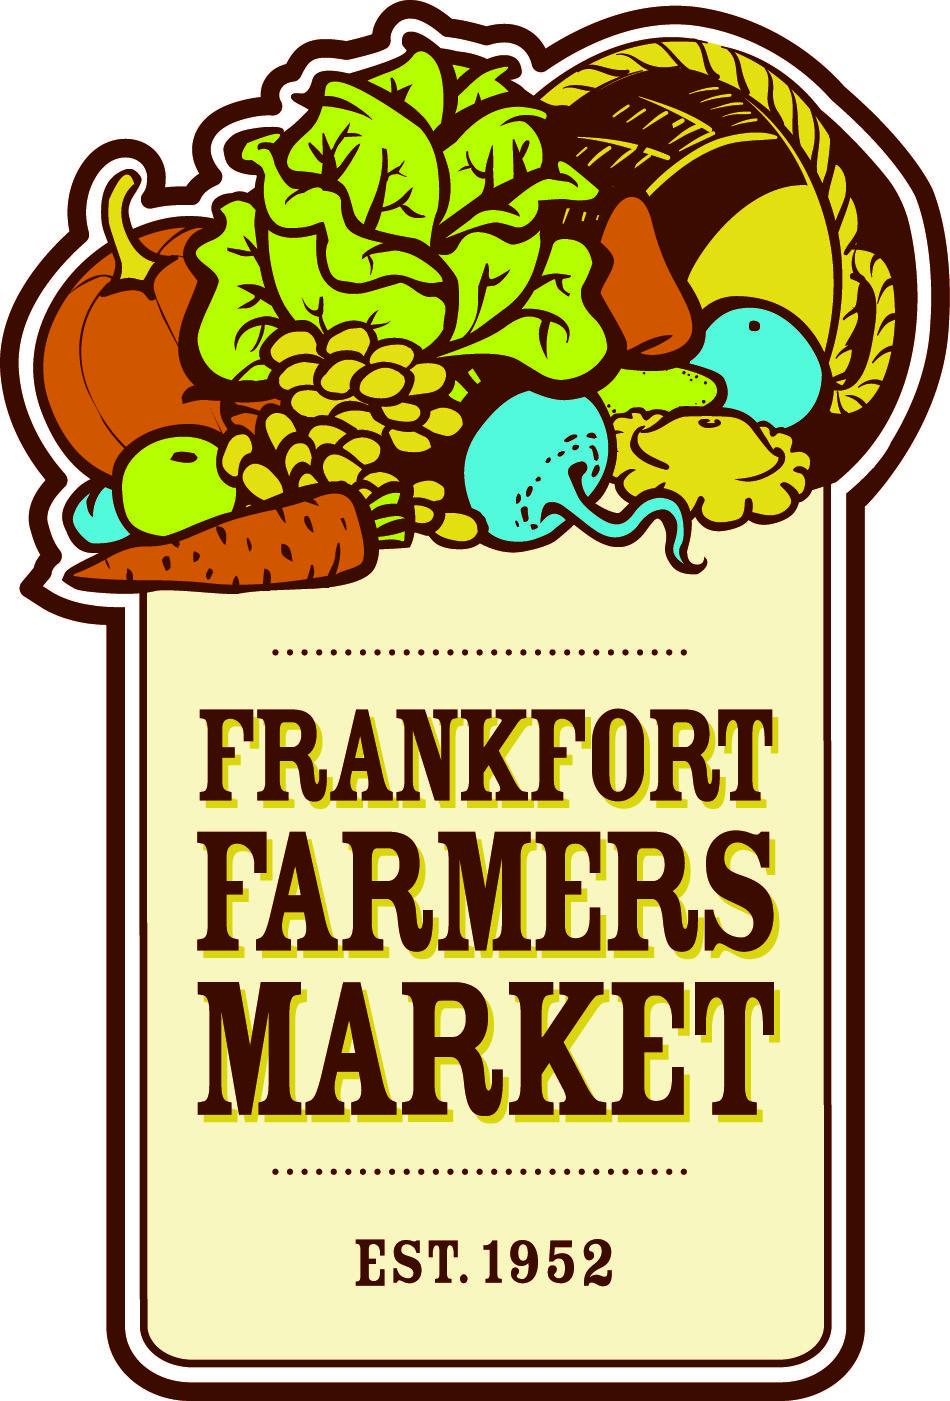 deans natural food market locations